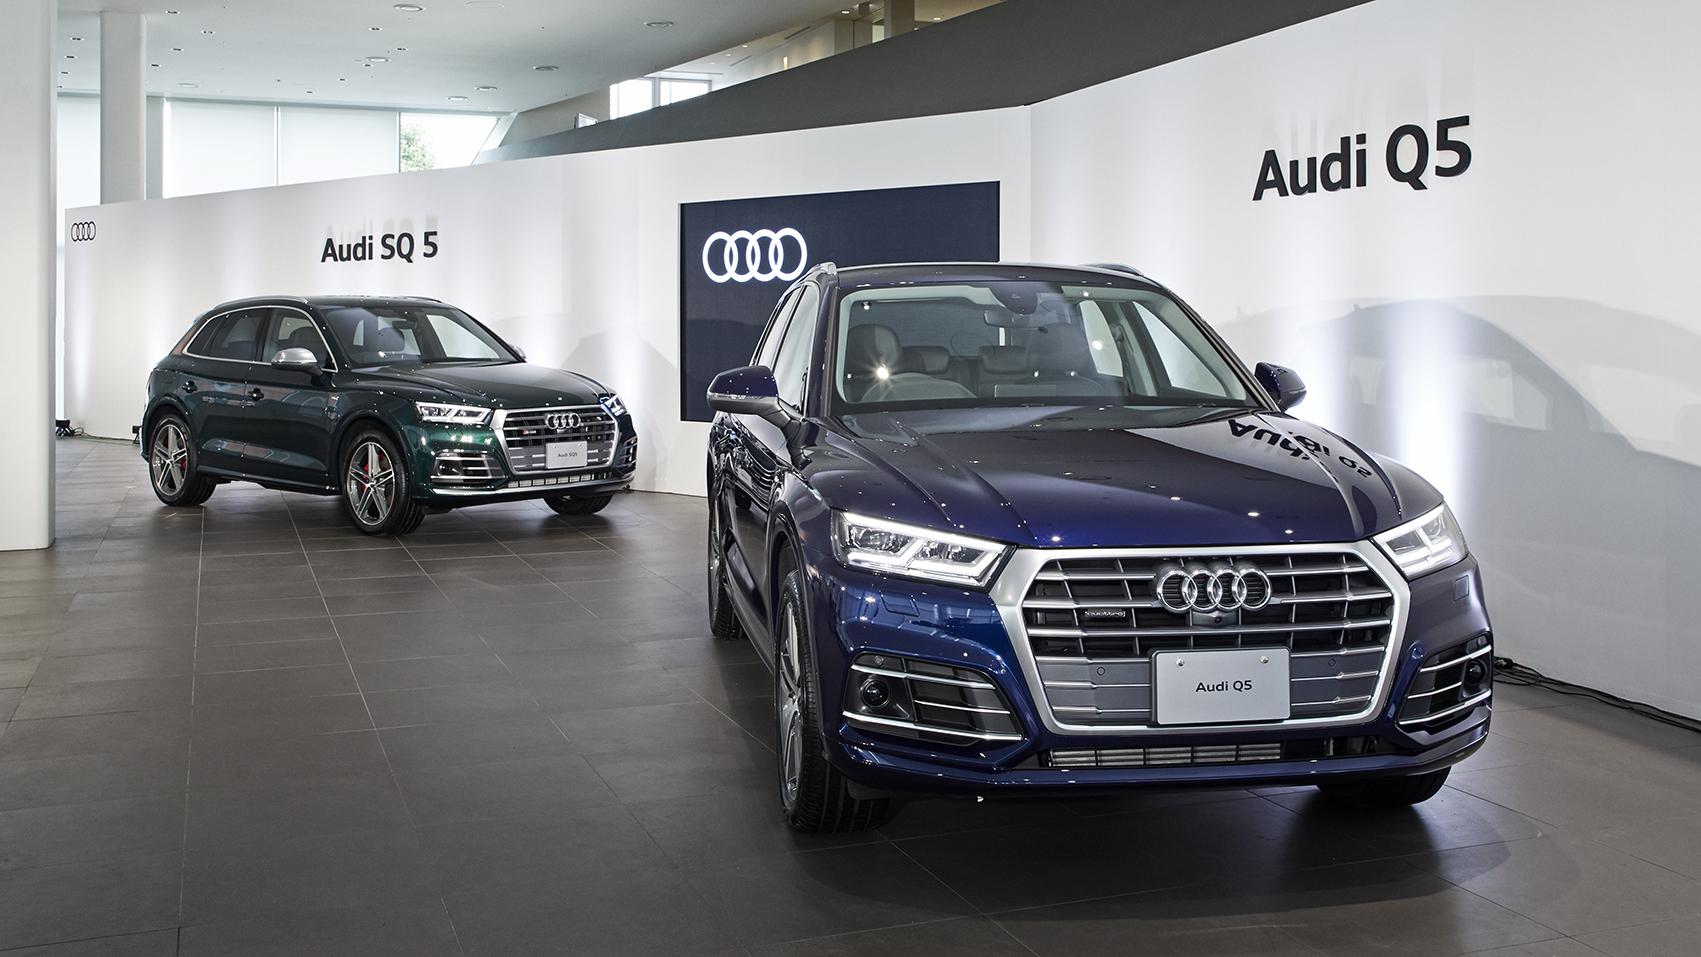 The new Audi Q5 記者発表会 Movie公開